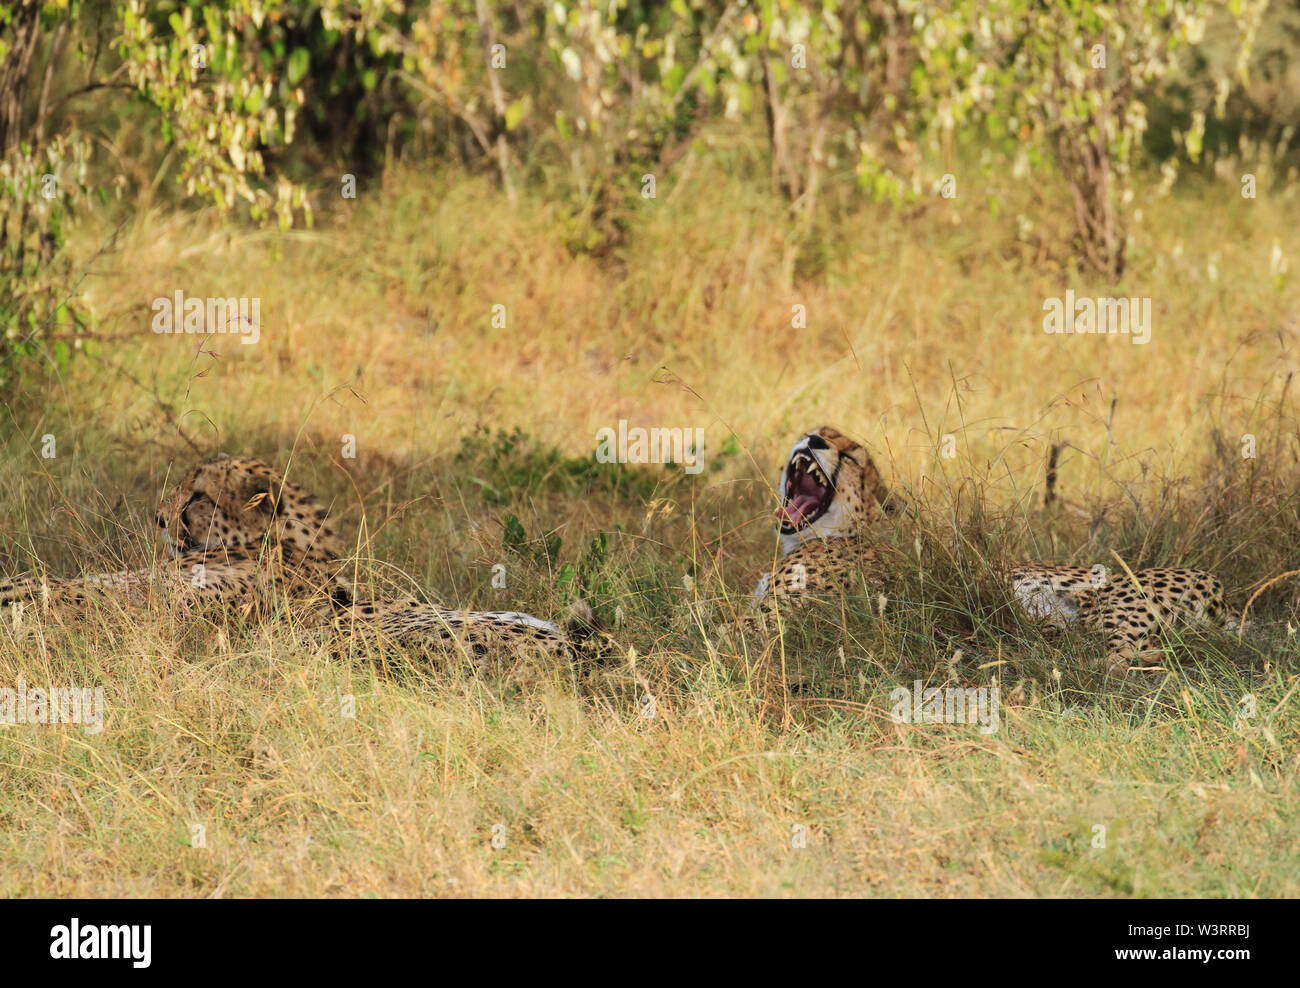 Cheetah Acinonyx jubatus four cheetahs brothers yawn yawning wide teeth tongue lying down in green yellow grass Masai Mara National Reserve copy space - Stock Image